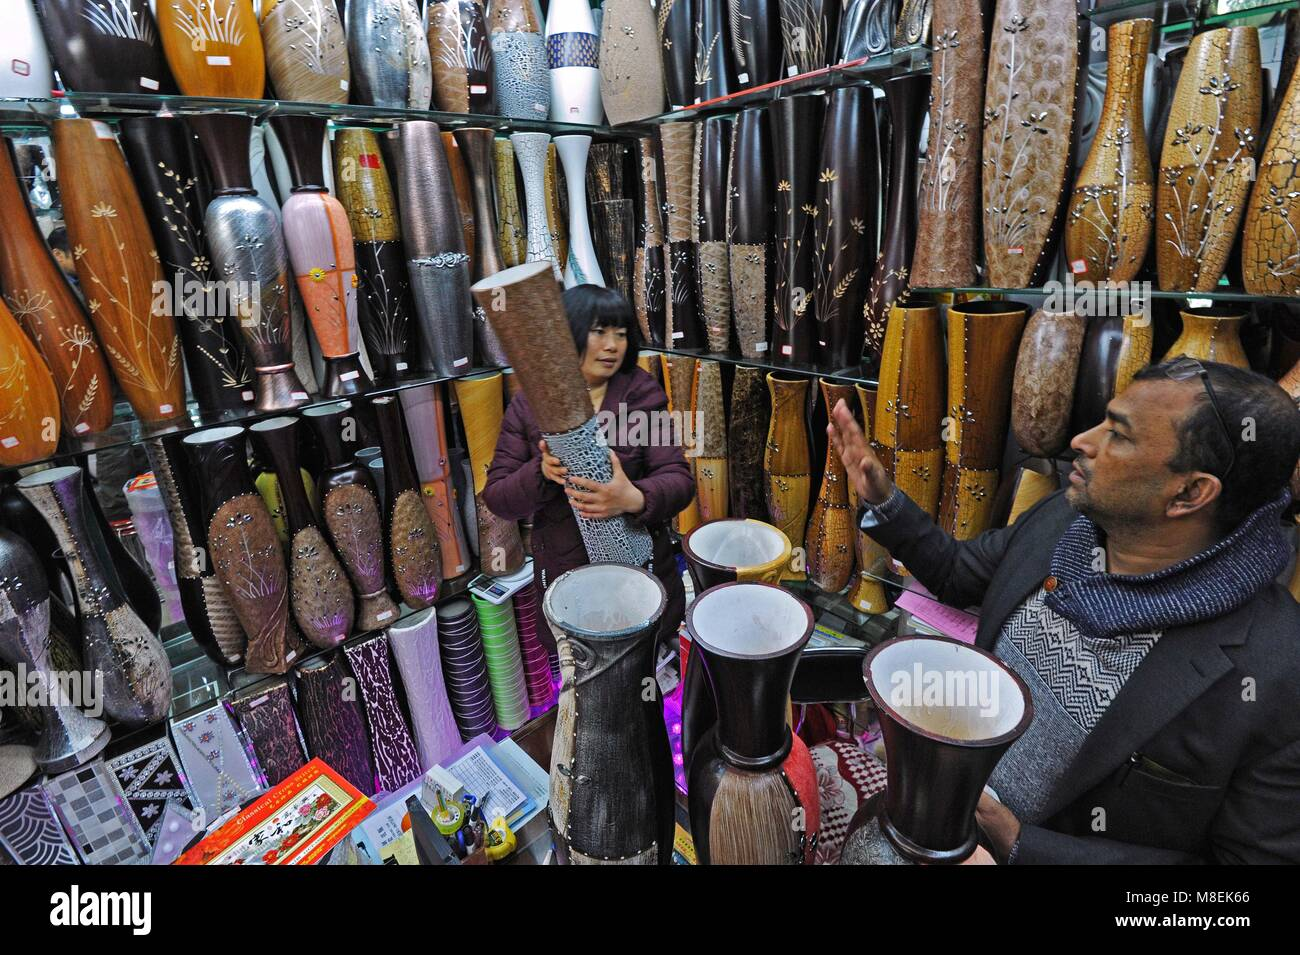 (180317) - YIWU, März 17, 2018 (Xinhua) - Bangladesch Geschäftsmann Ariful Islam (R) wählt Vasen Stockbild